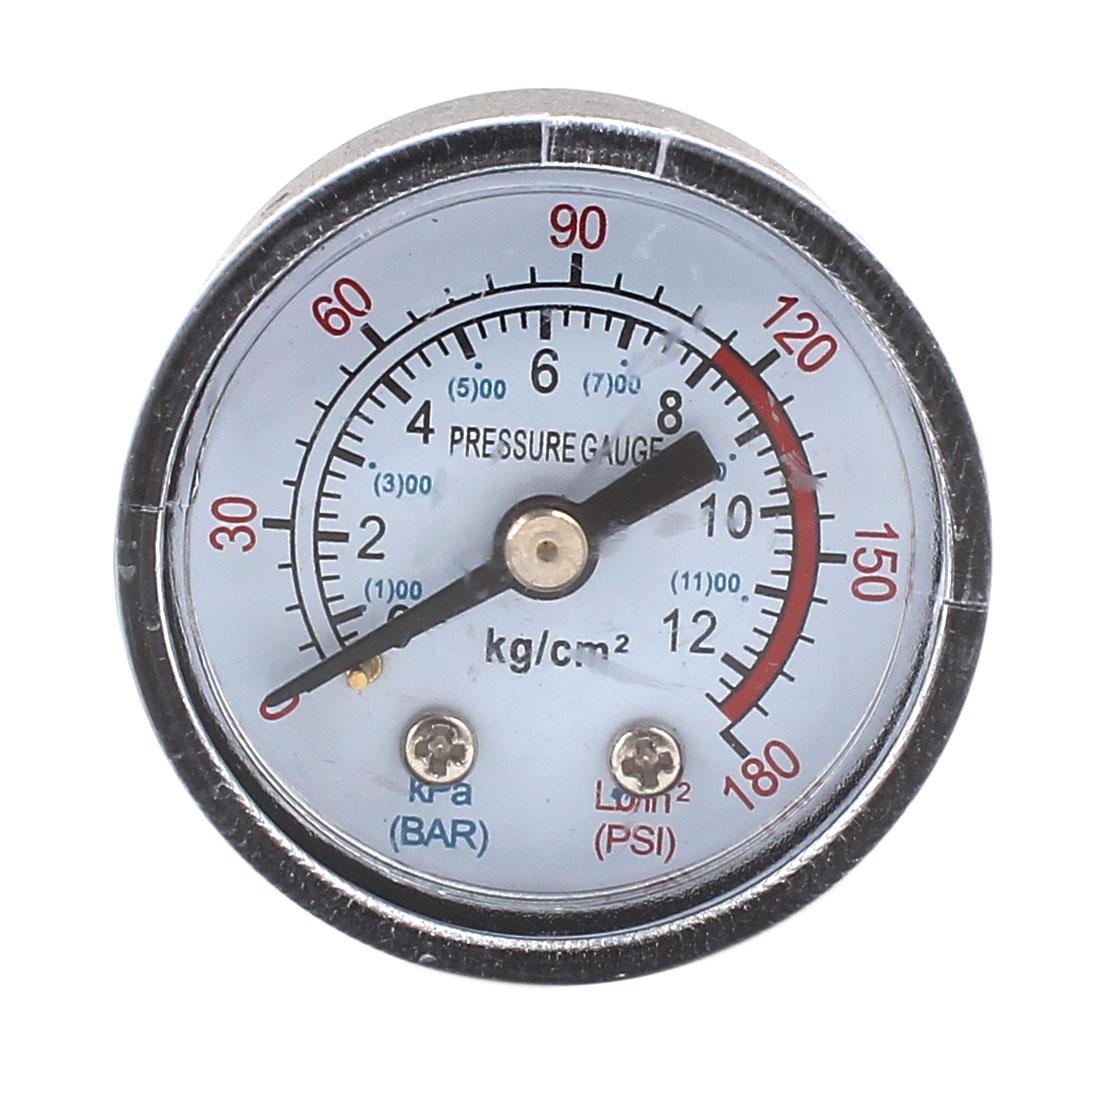 1/8PT Male Thread Round Dial 0-180PSI 0-12BAR Pressure Gauge